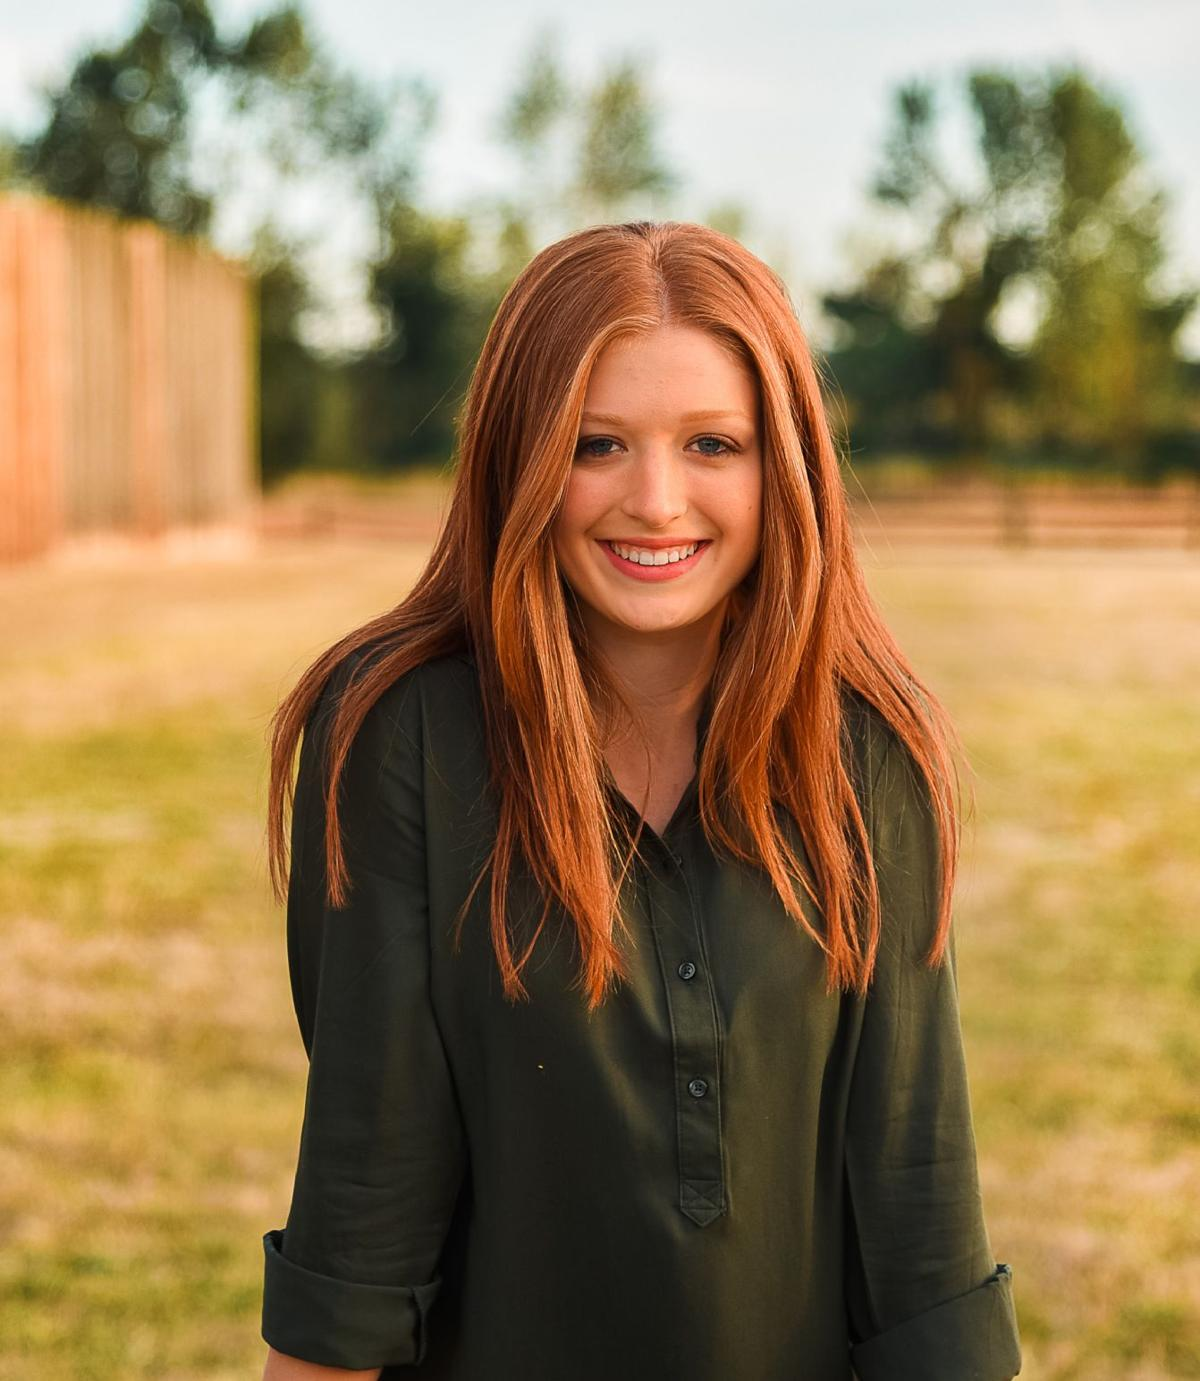 Rachel Johnson, Valedictorian